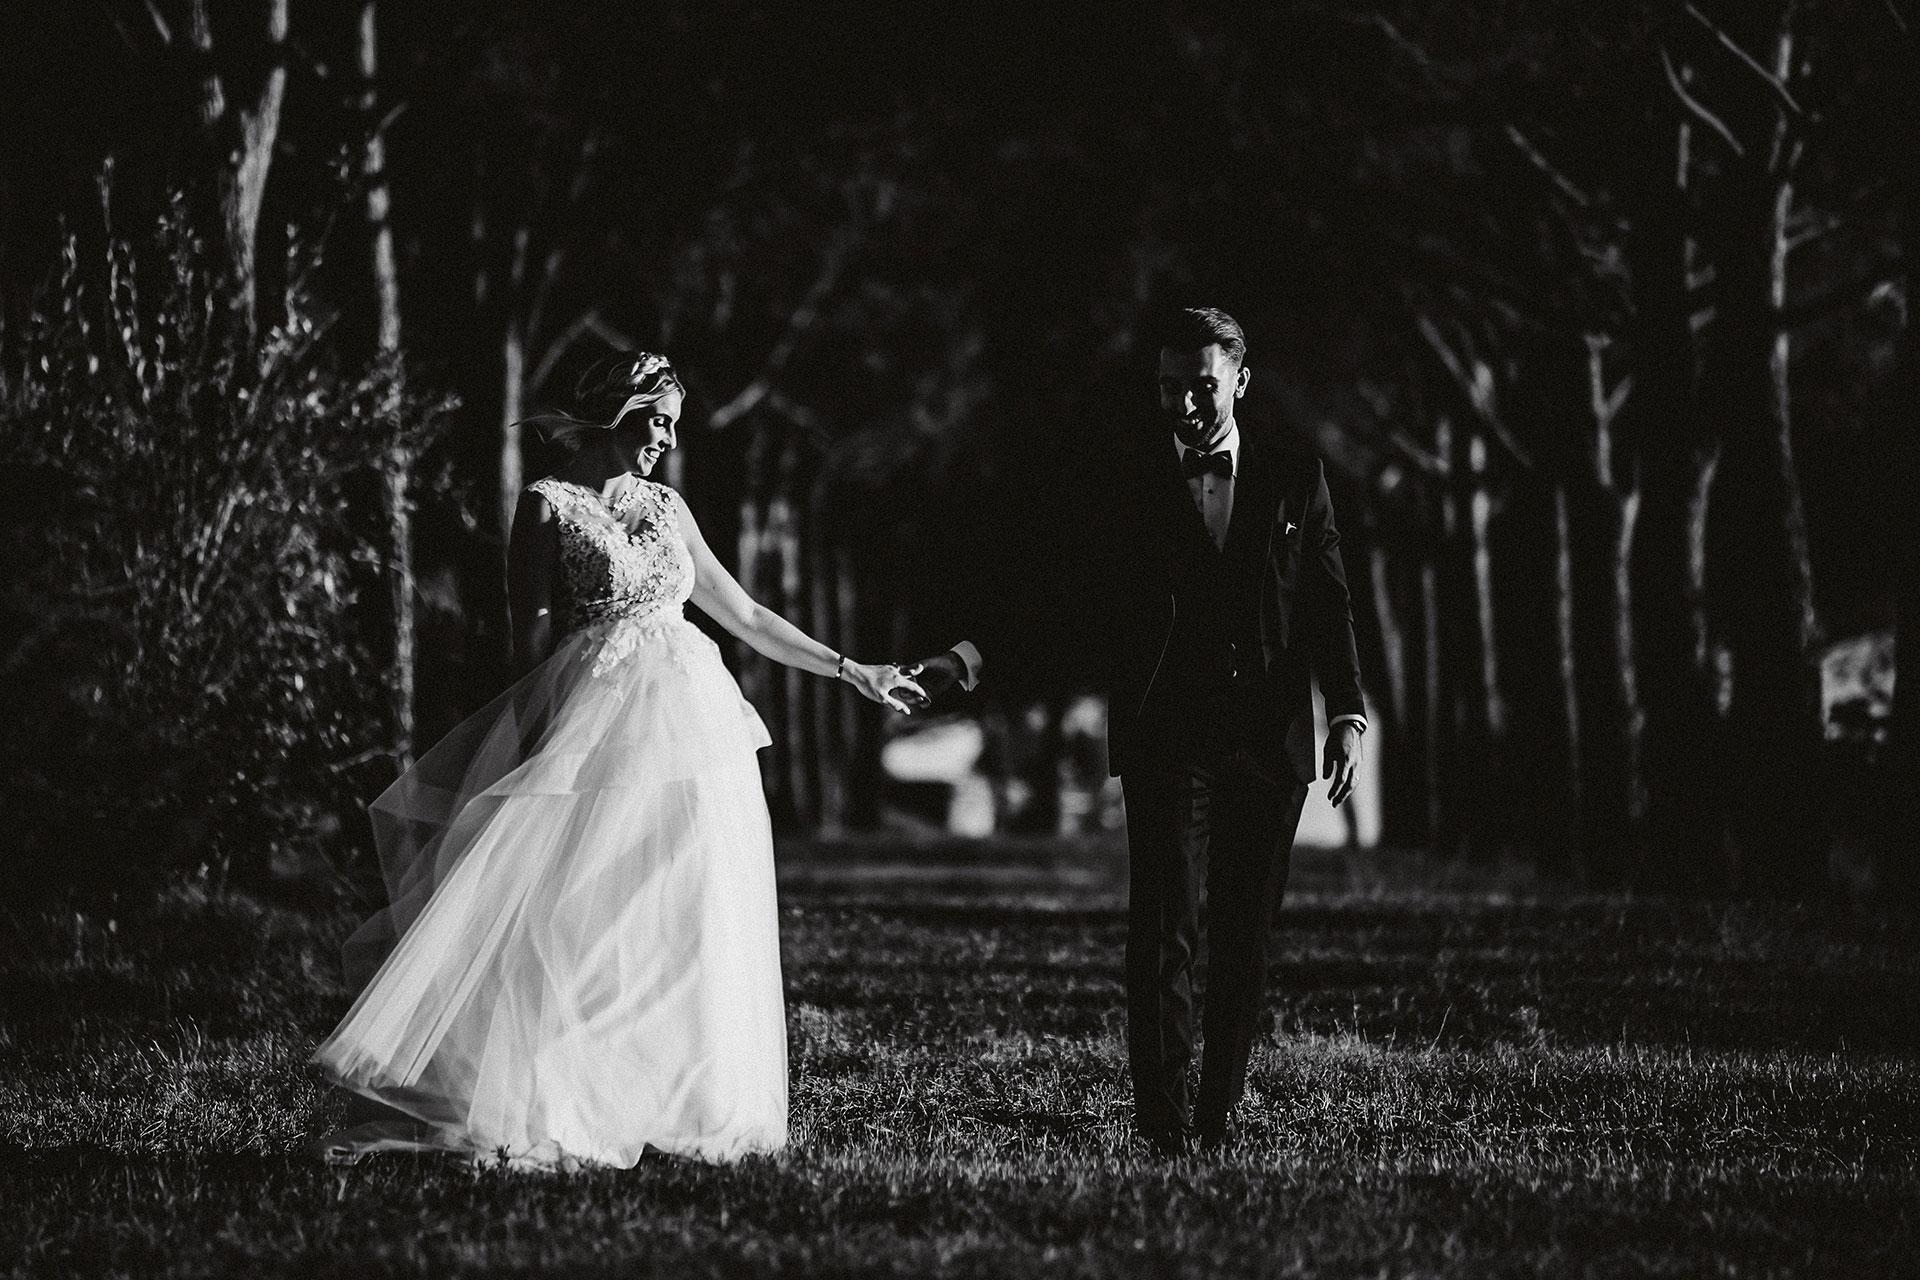 english wedding by the lake